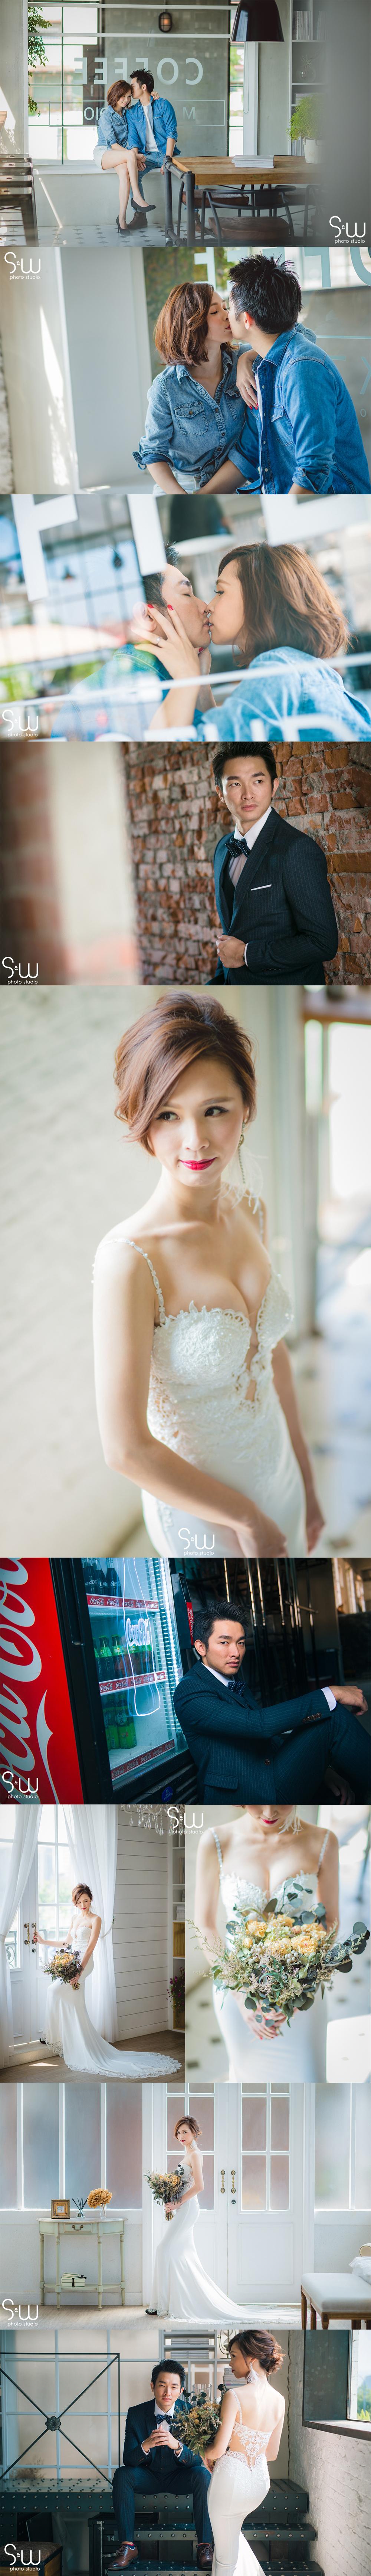 PRE WEDDING |TAIPEI(台北婚紗) | sw photo studio 婚禮, 婚攝, 婚紗, 海外婚禮, 海外婚紗, 海島婚禮,峇里島婚禮, 峇里島婚紗, 台灣婚禮, 婚攝推薦